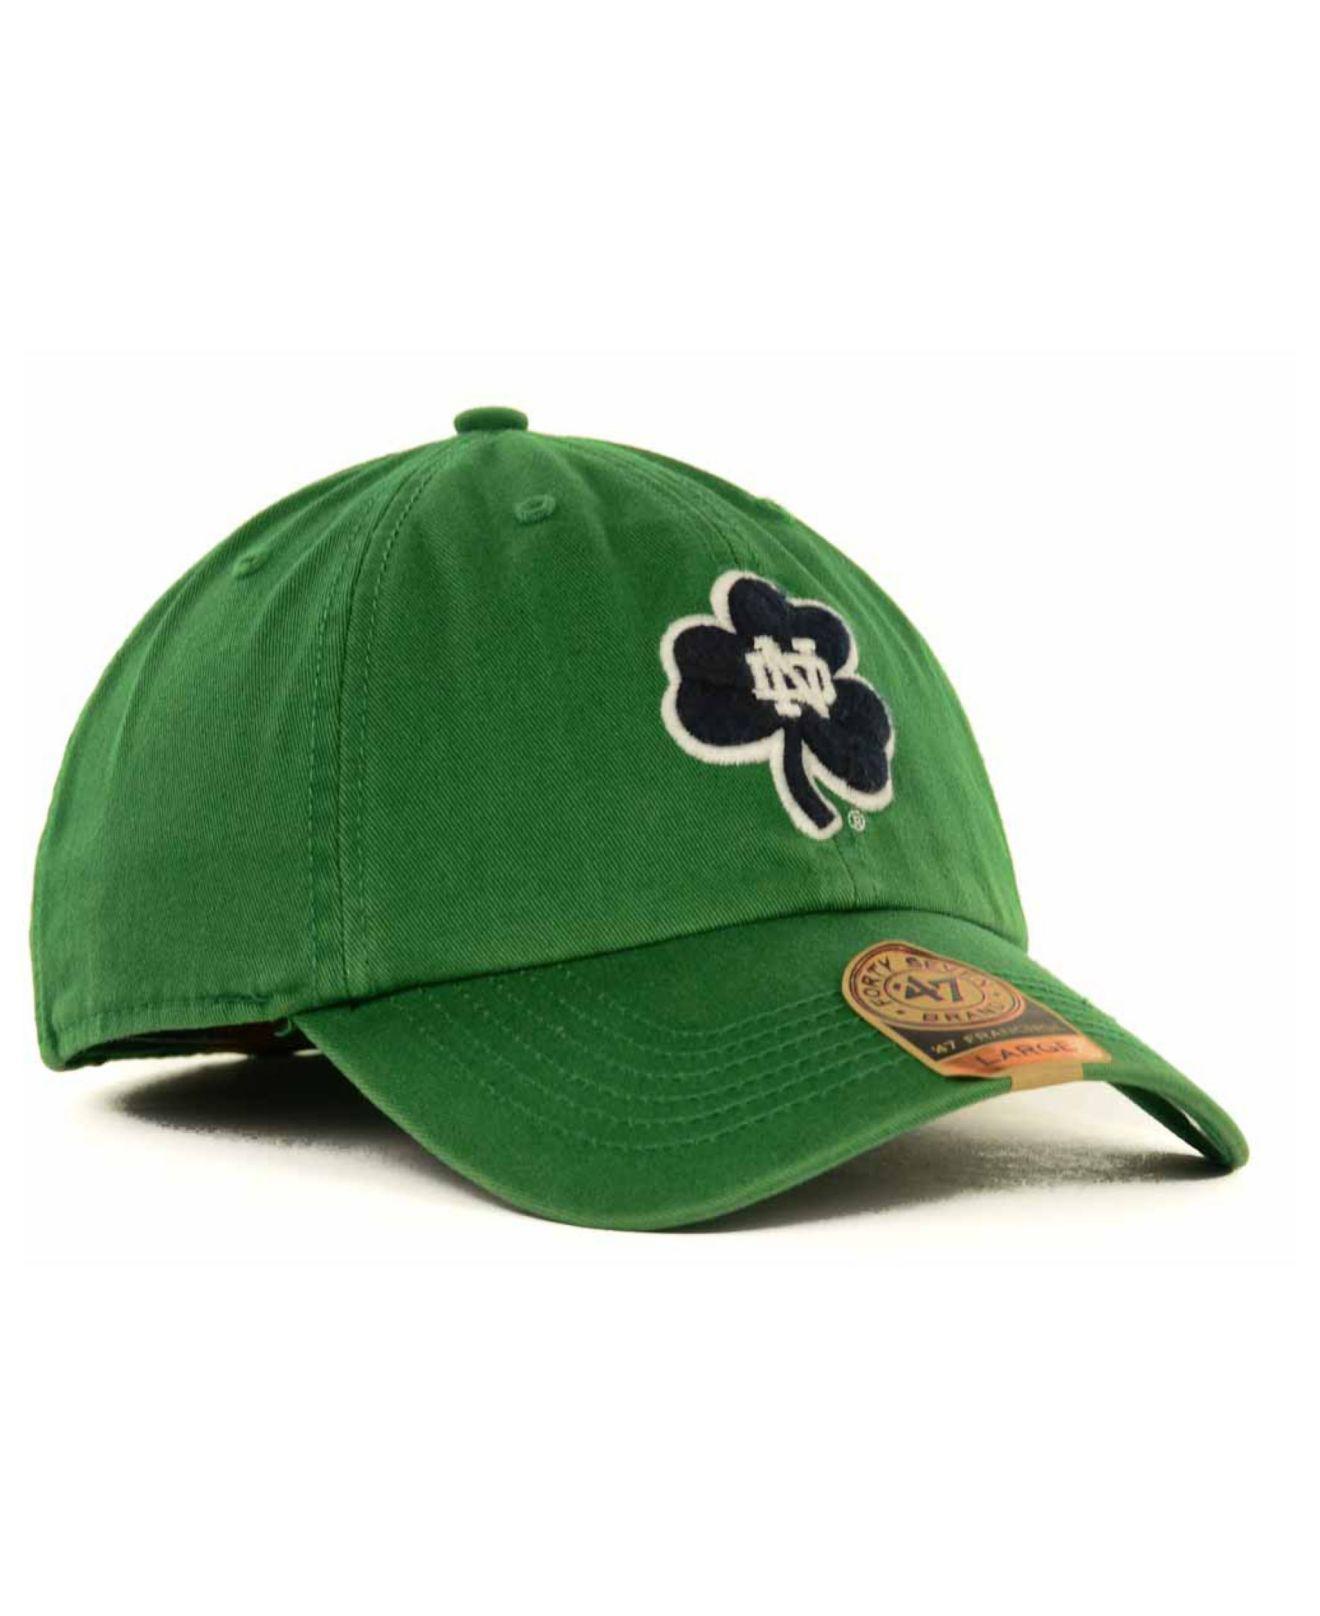 best value b7282 cdb1a ... denmark lyst 47 brand notre dame fighting irish franchise cap in blue  for men 9f443 33cdf